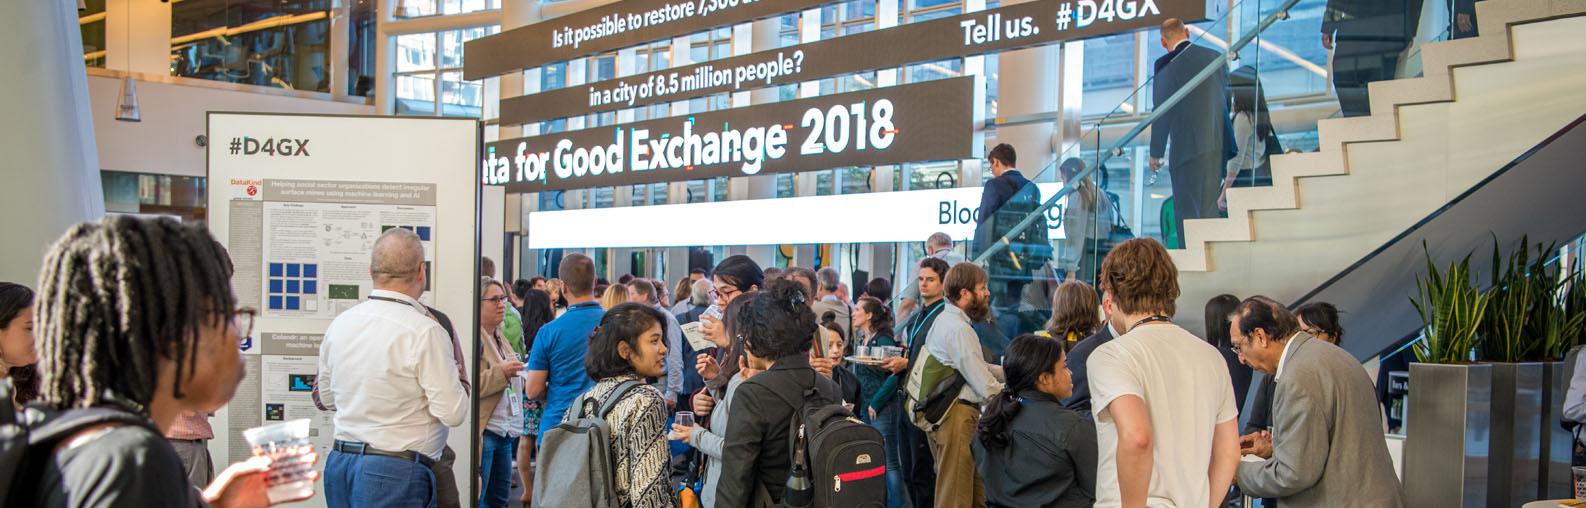 Data for Good Exchange 2019